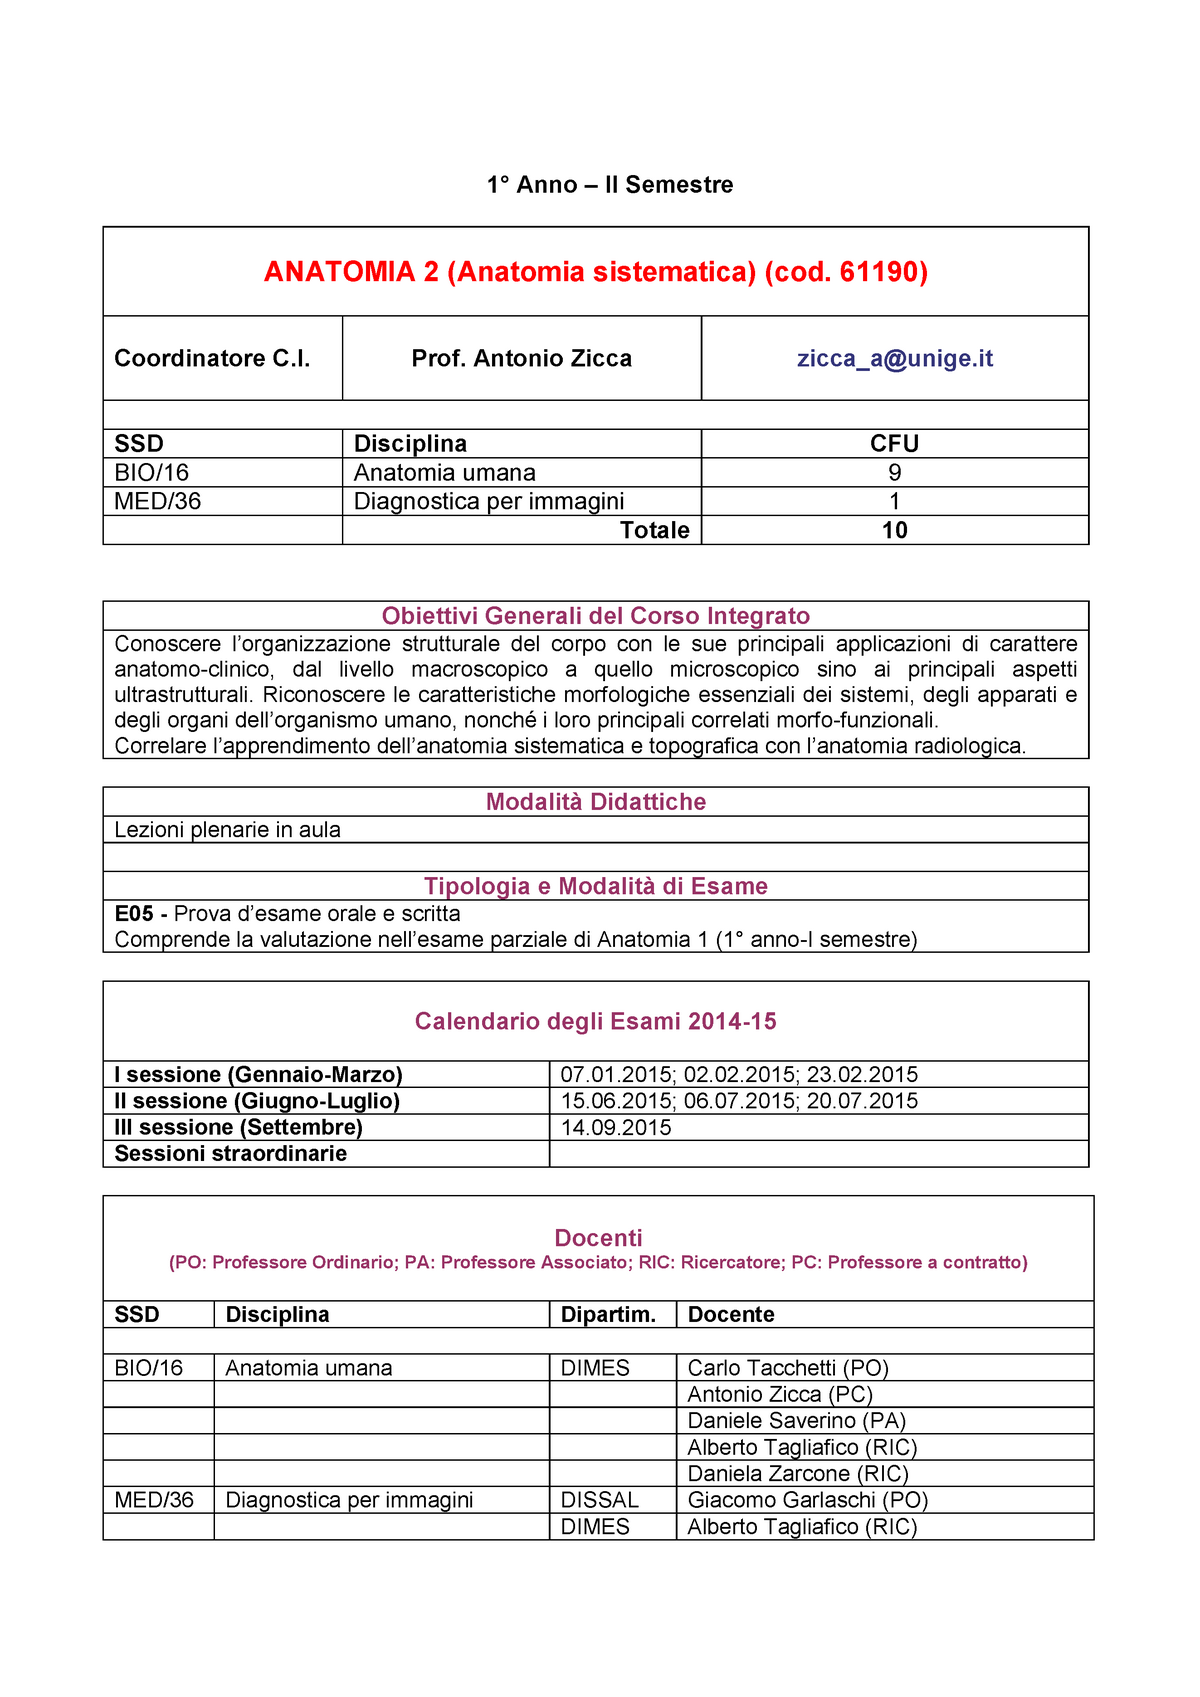 Calendario Esami Unige.Anatomia 2 58164 Unige Studocu